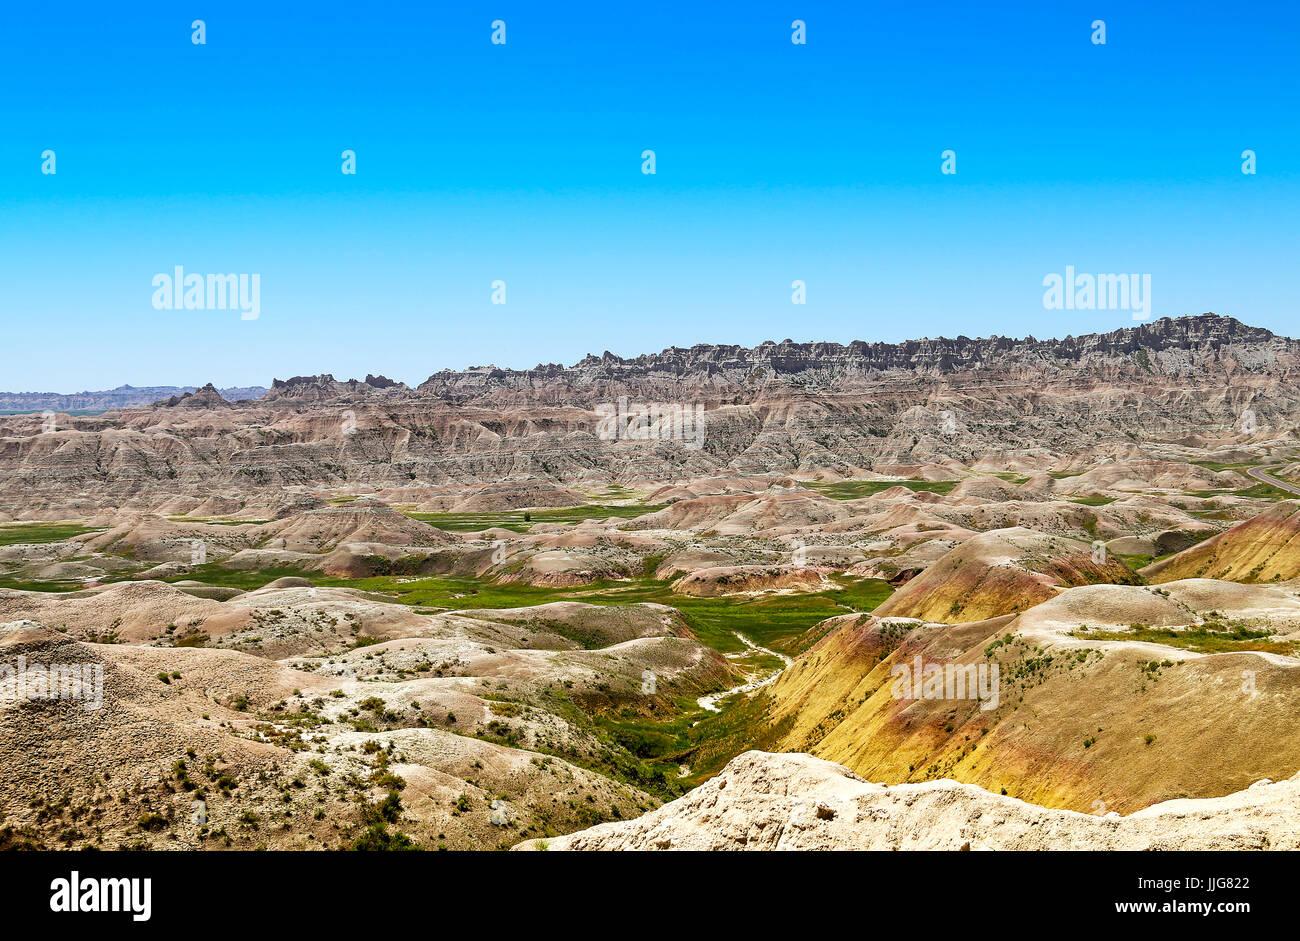 Badlands deserto dipinto Foto Stock